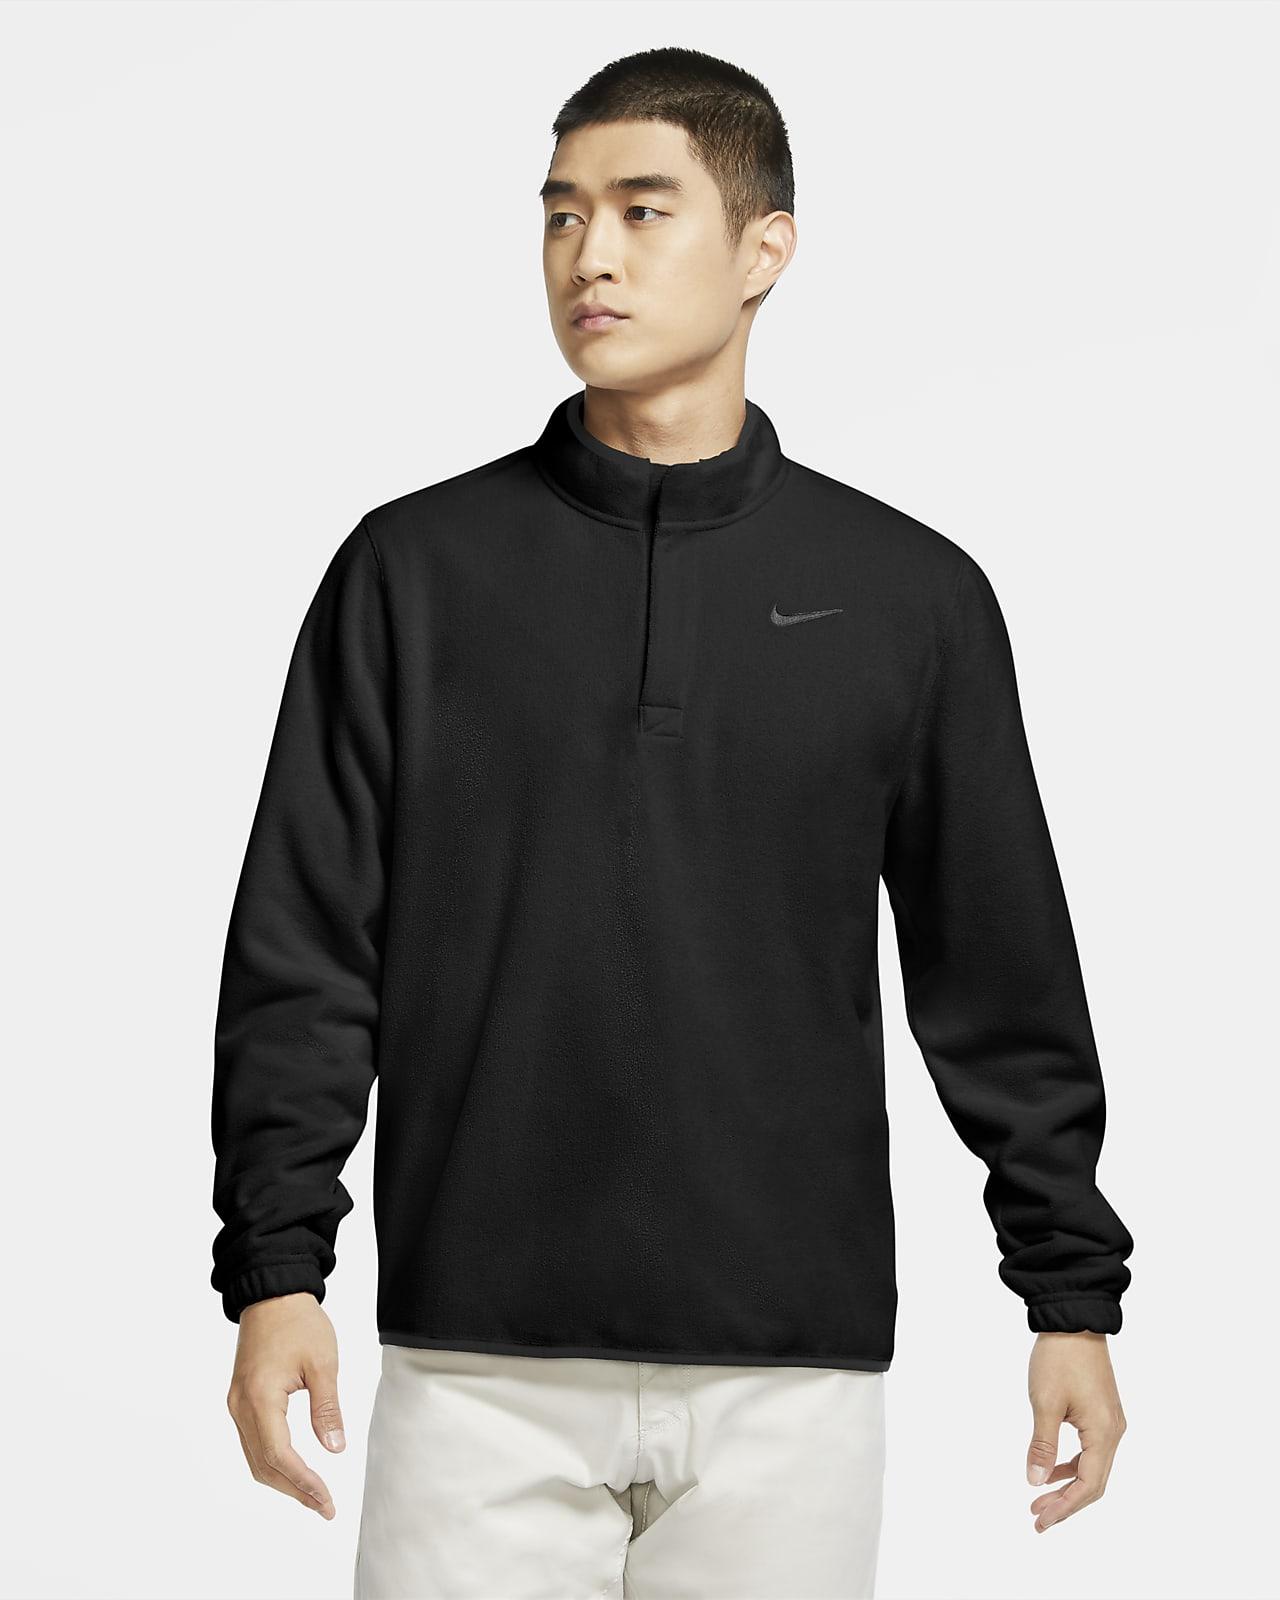 Nike Therma Victory Men's 1/2-Zip Golf Top